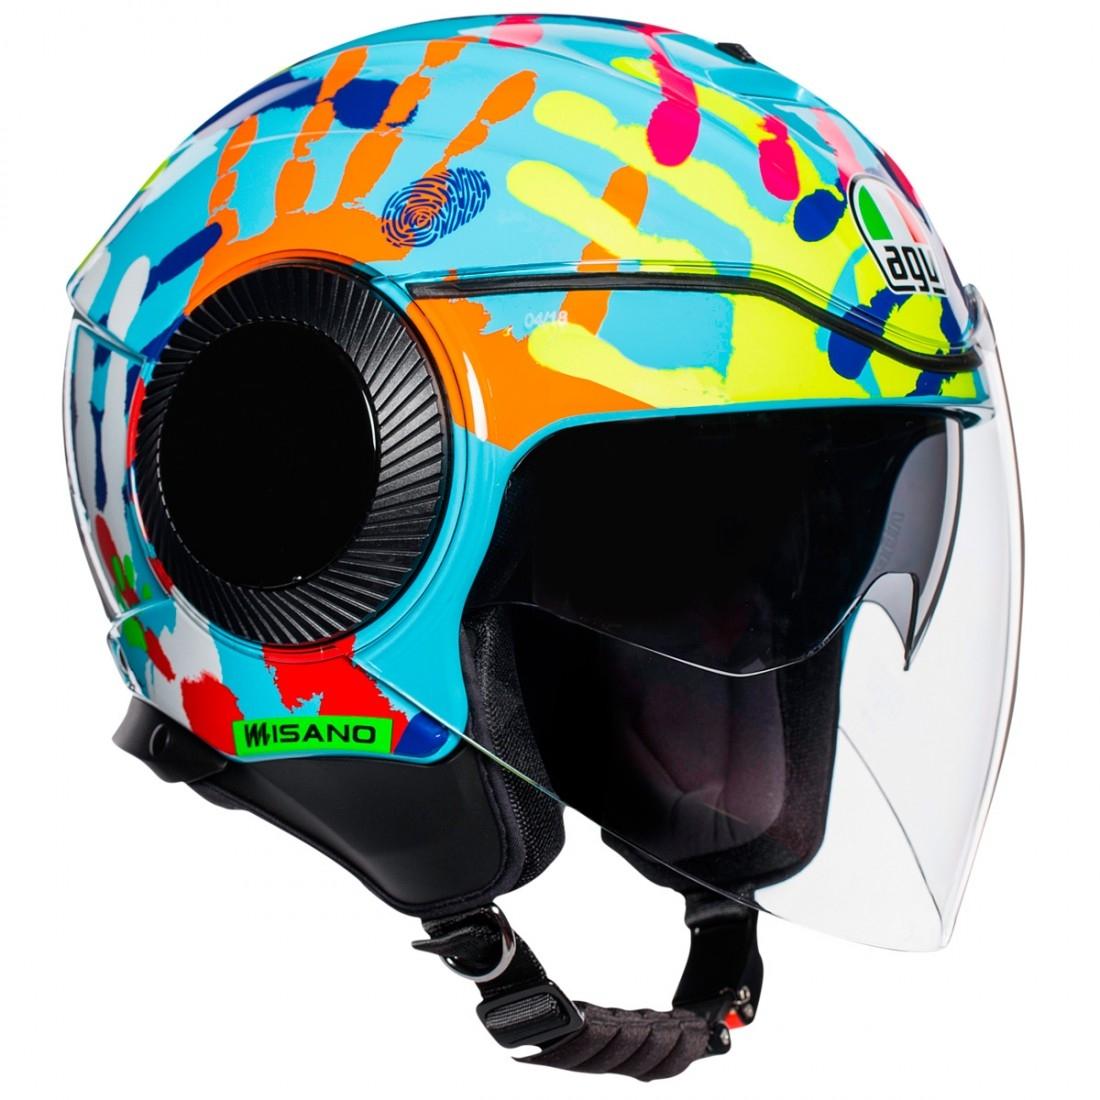 1e4bac5e7e7a AGV Orbyt Rossi Misano 2014 Helmet · Motocard